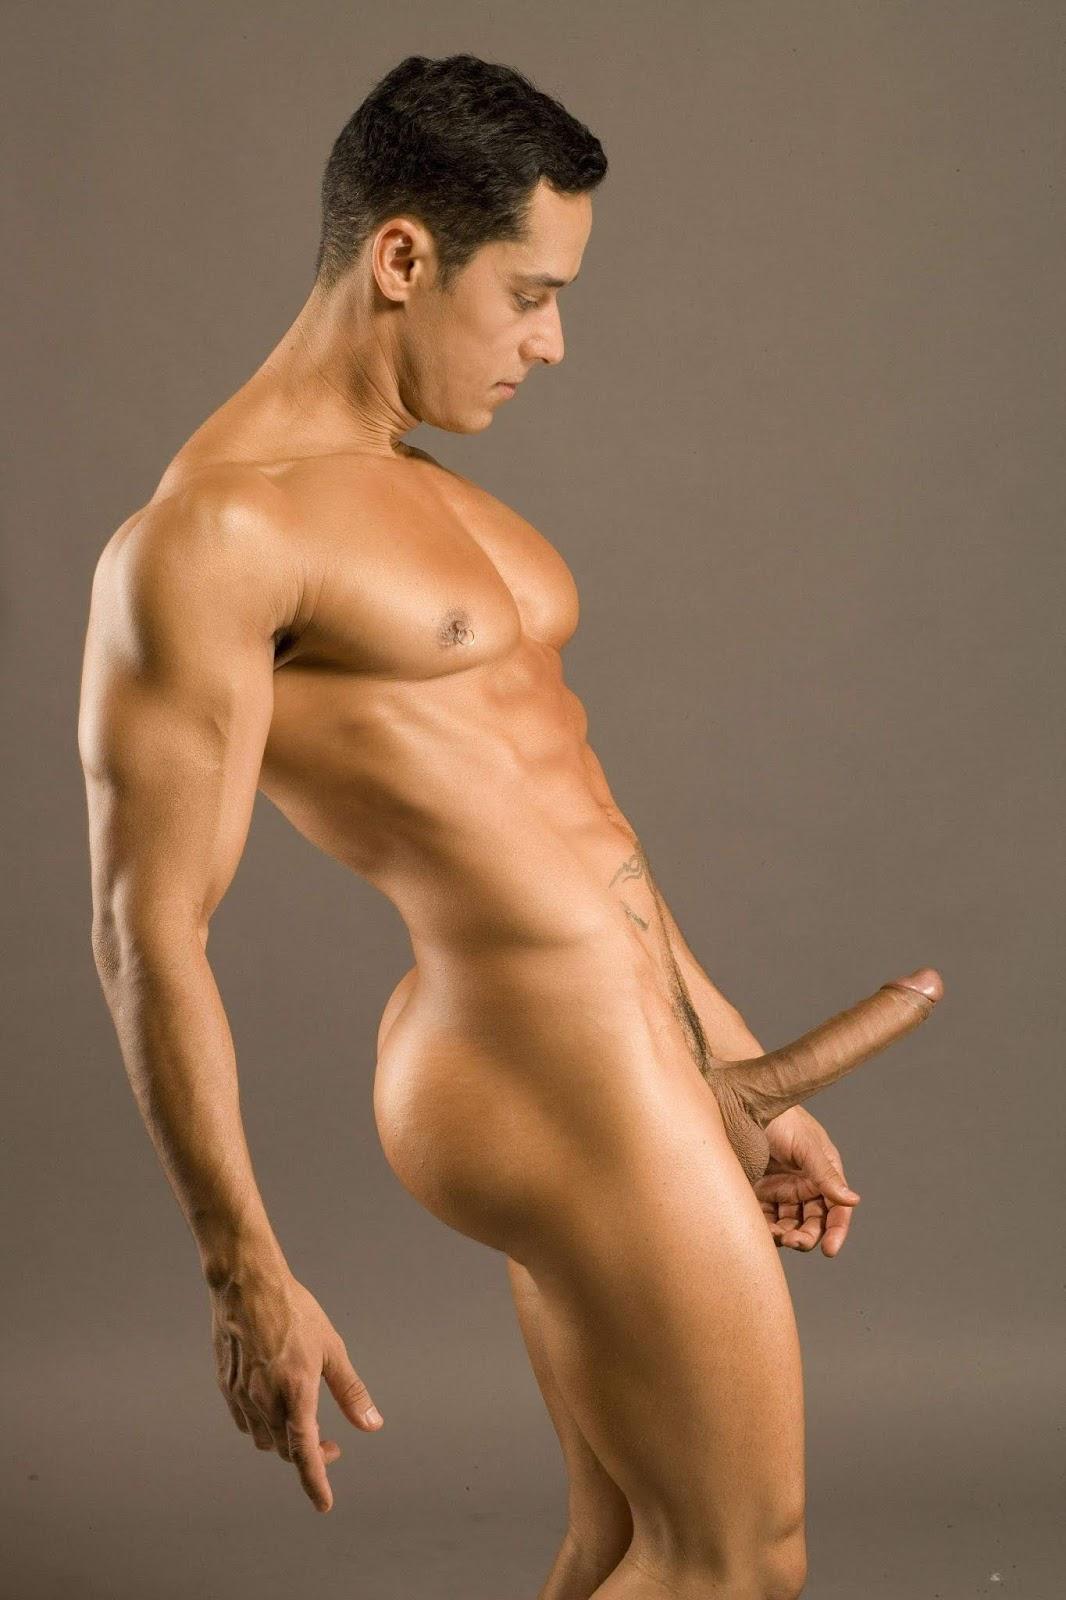 Gratis anushka male strippernudes with lyssa chanel